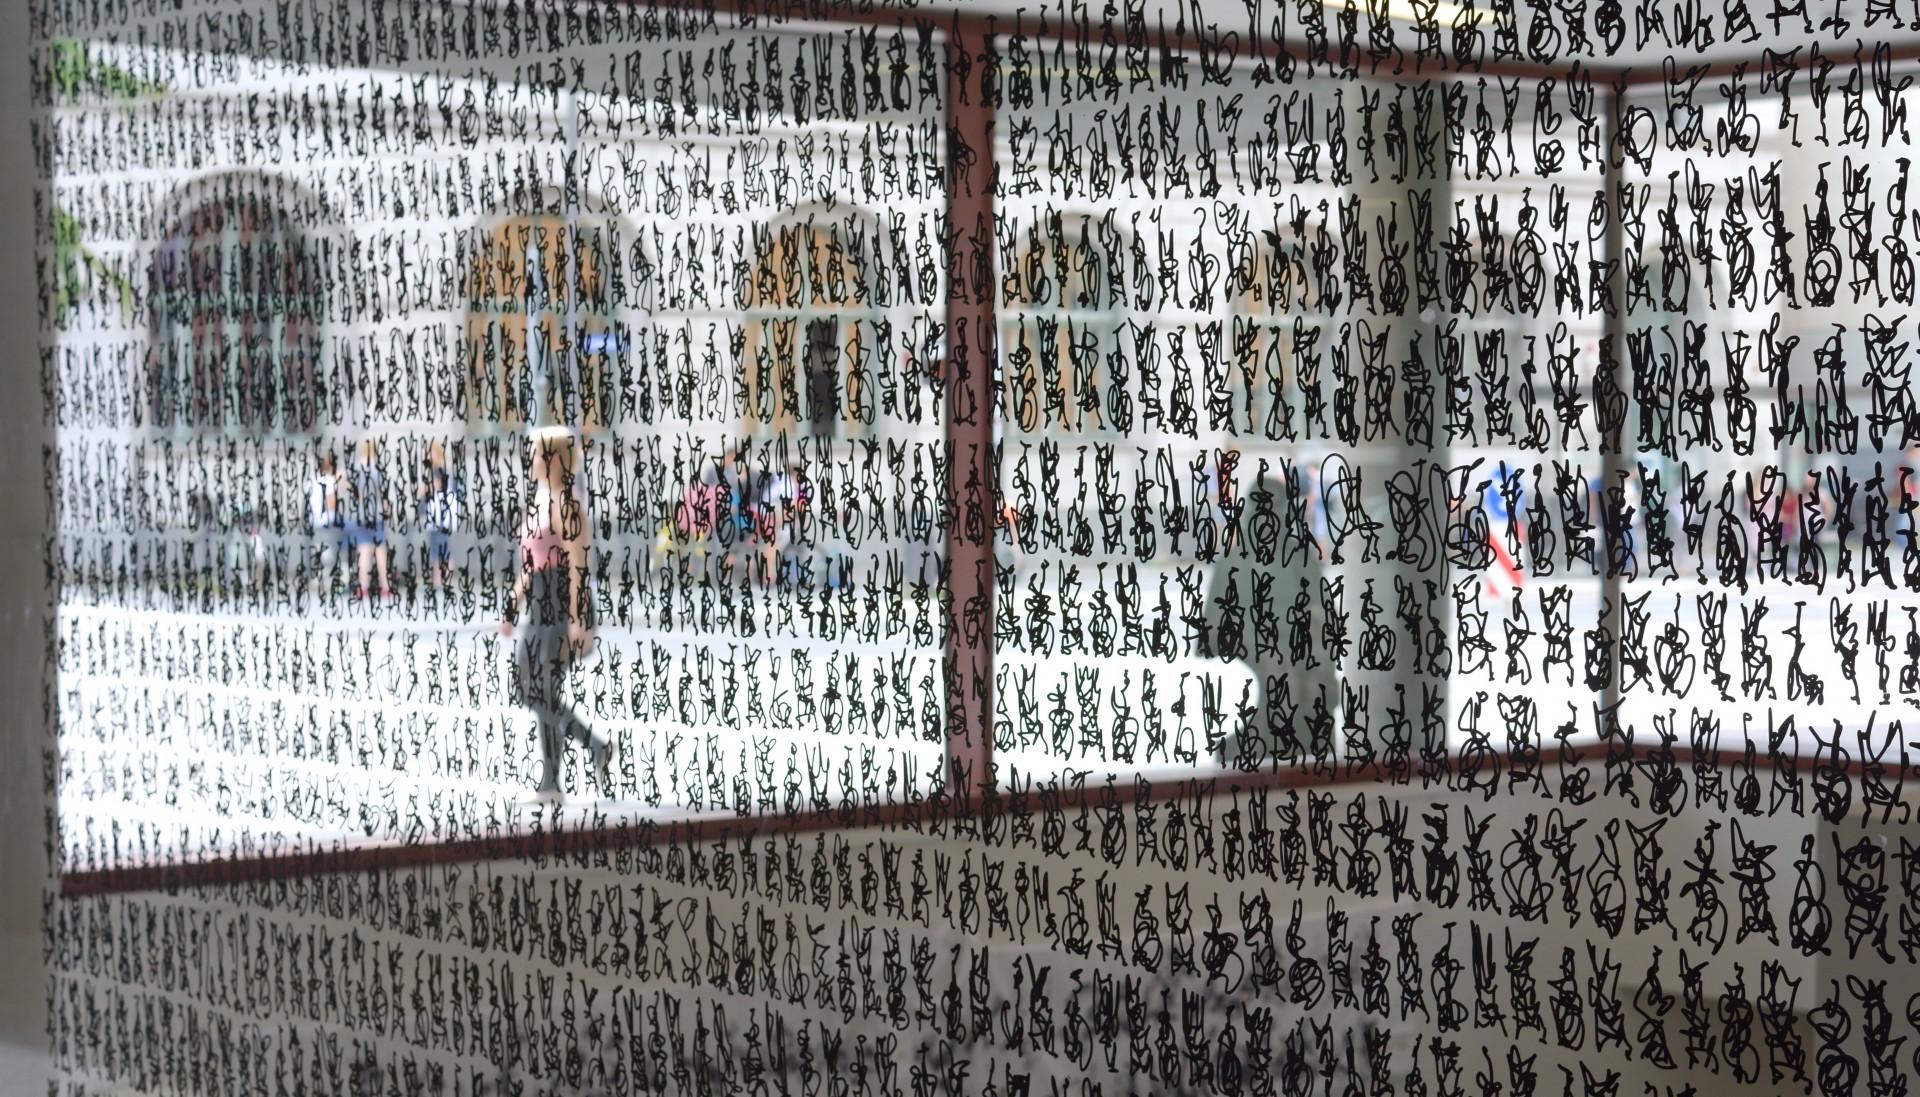 Axel Malik, Acryl auf Glas, 305 x 256 cm, 2017